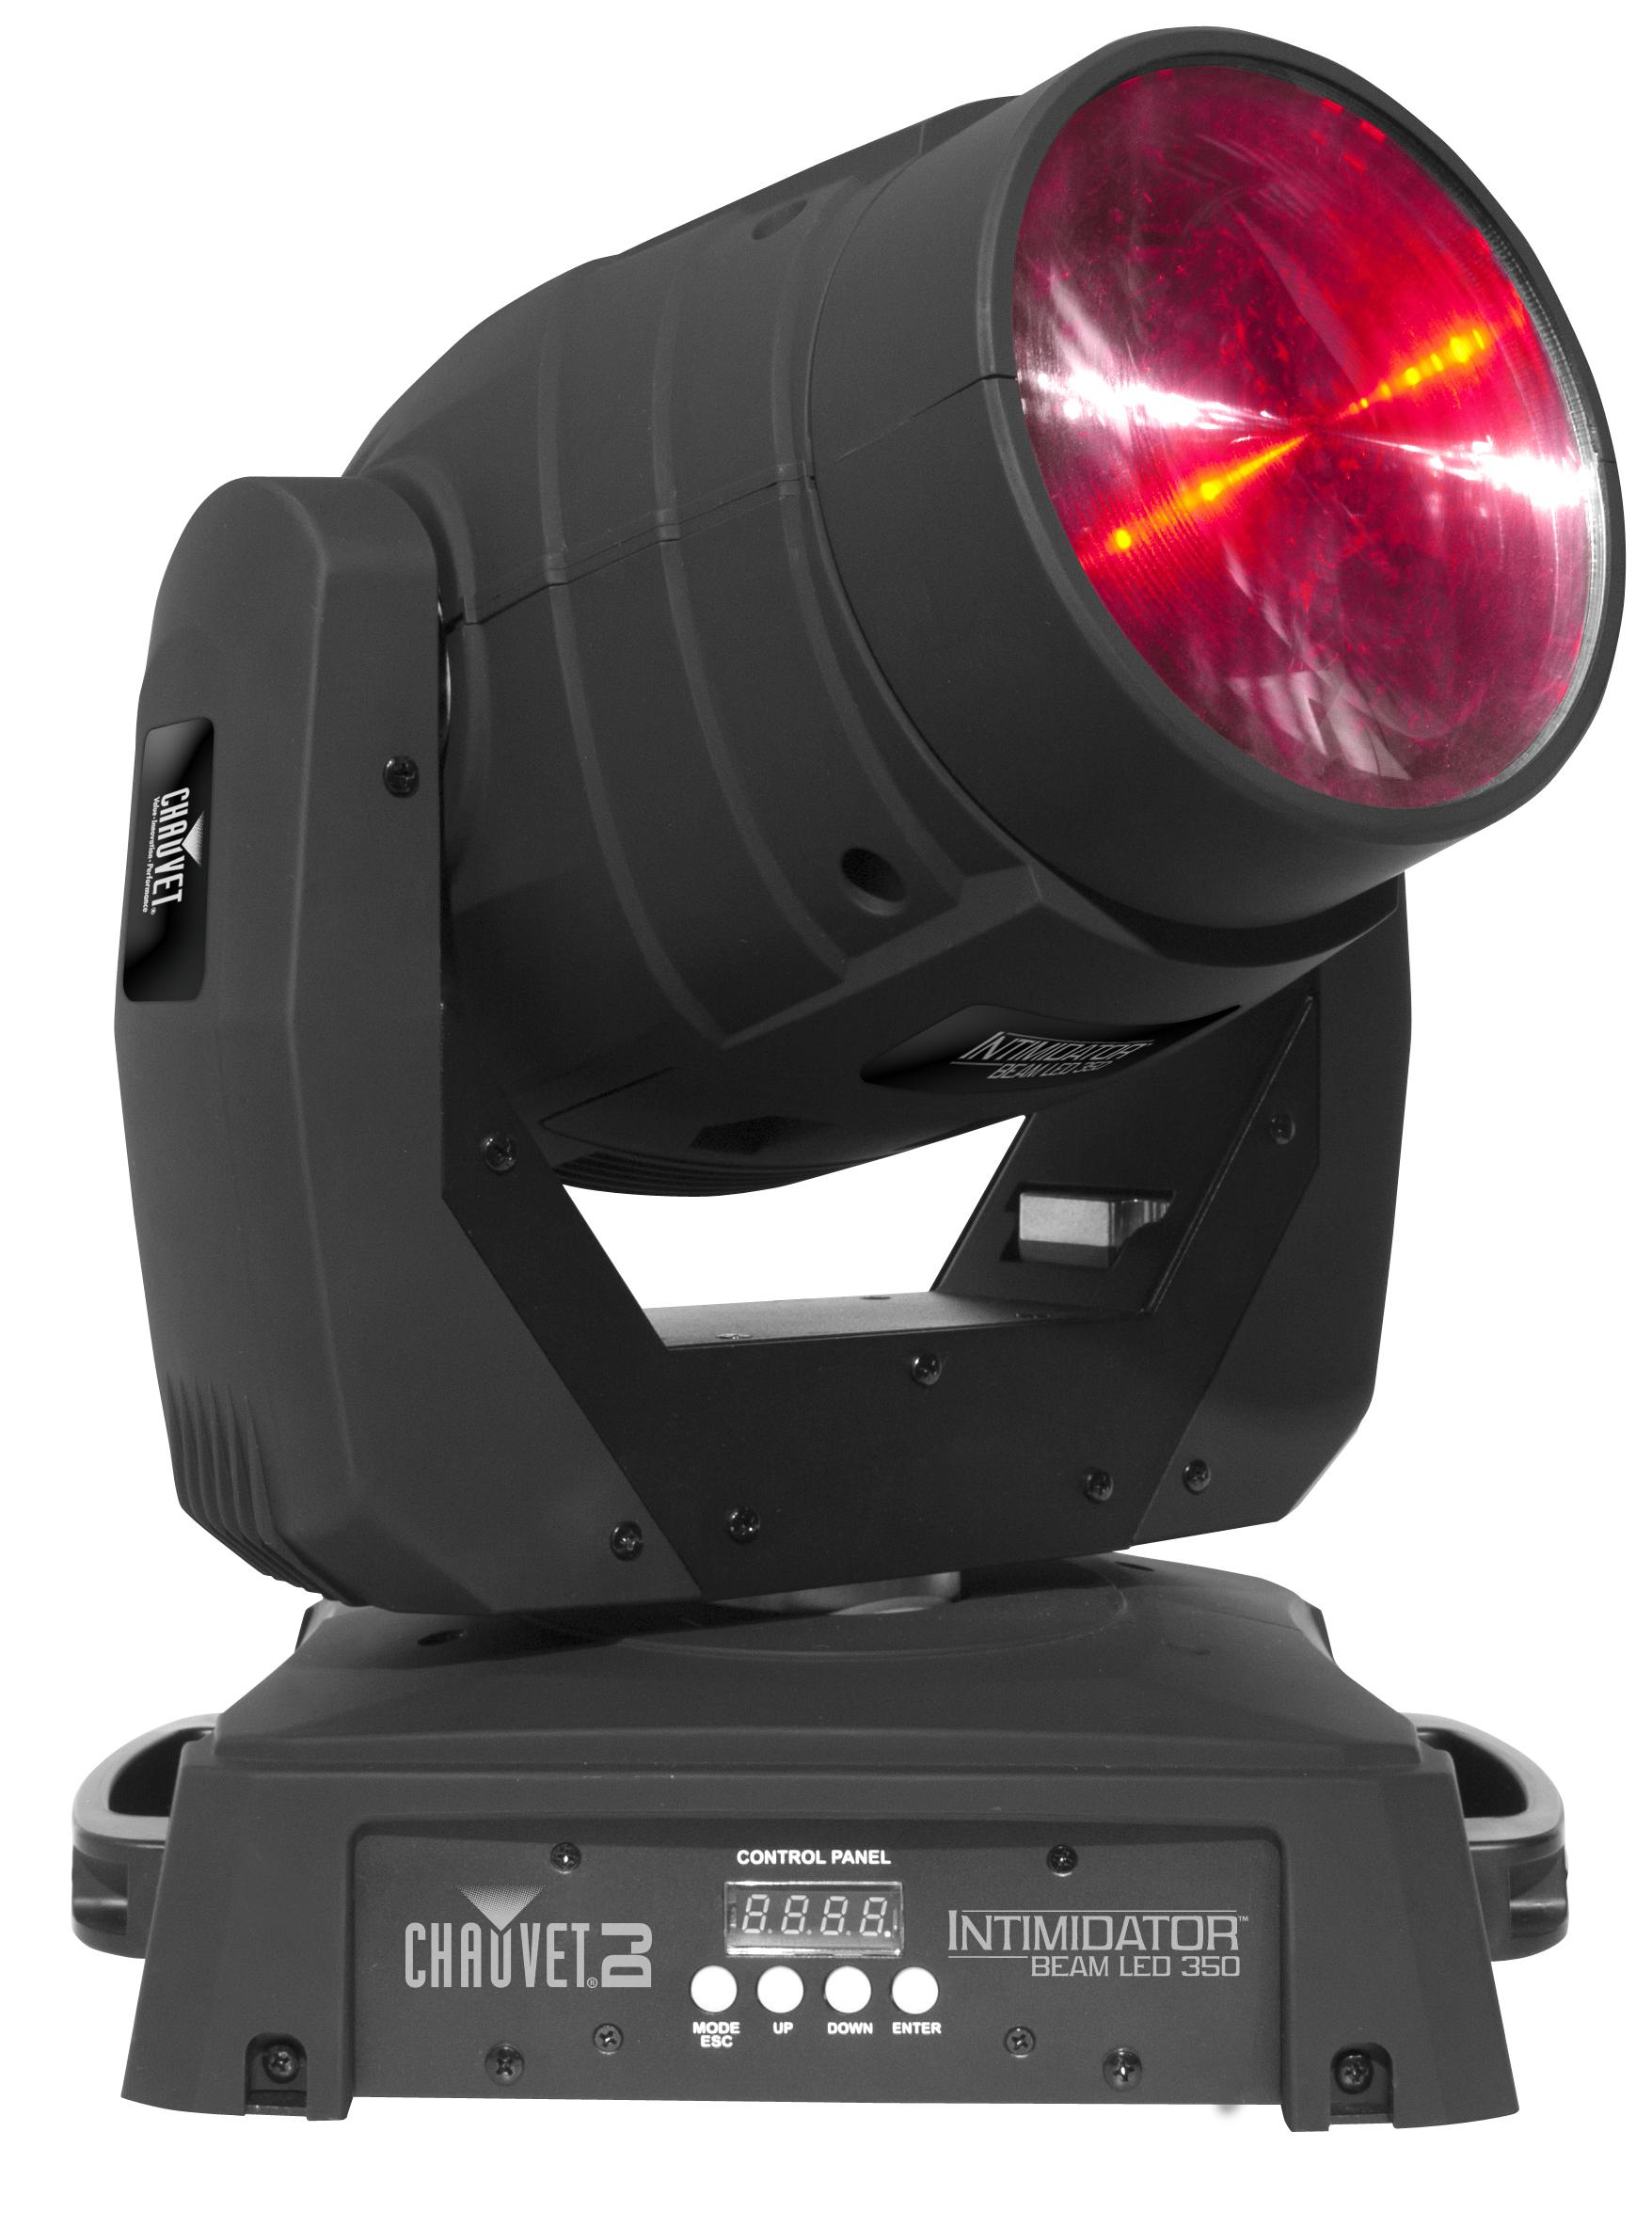 Chauvet Intimidator Beam LED 350 Moving Head Effect Light